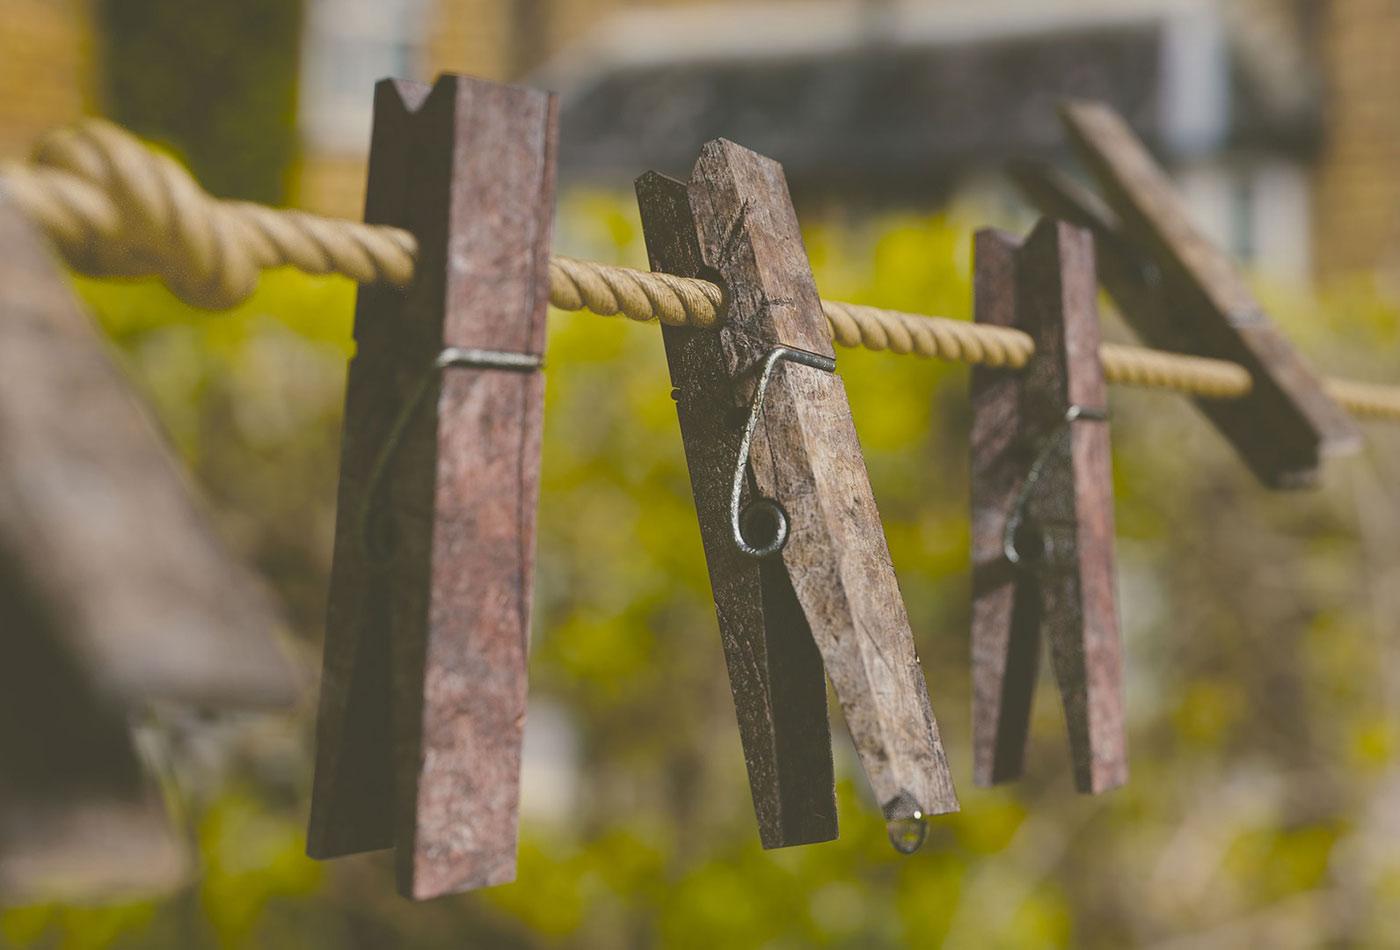 Clothespins.